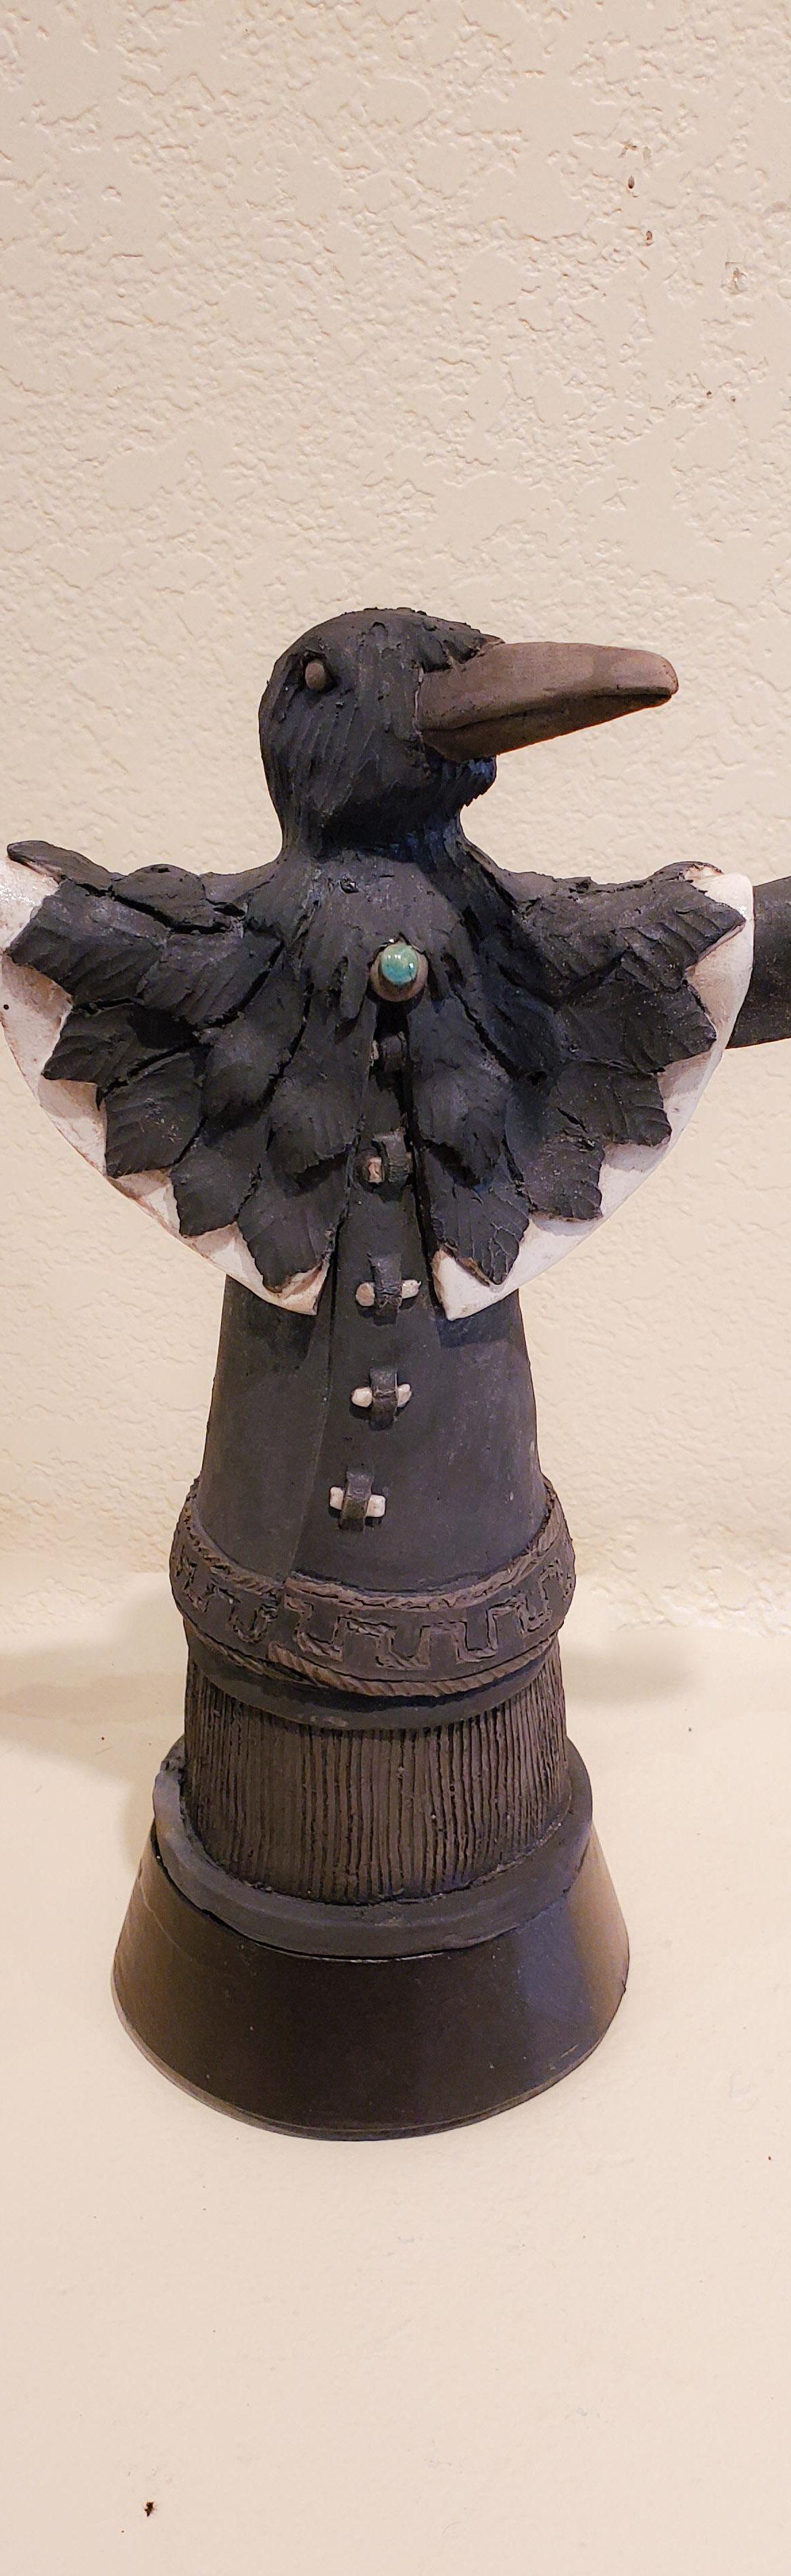 Dancing Raven #8, John Booth, Ceramic Sculpture, Rogoway Gallery